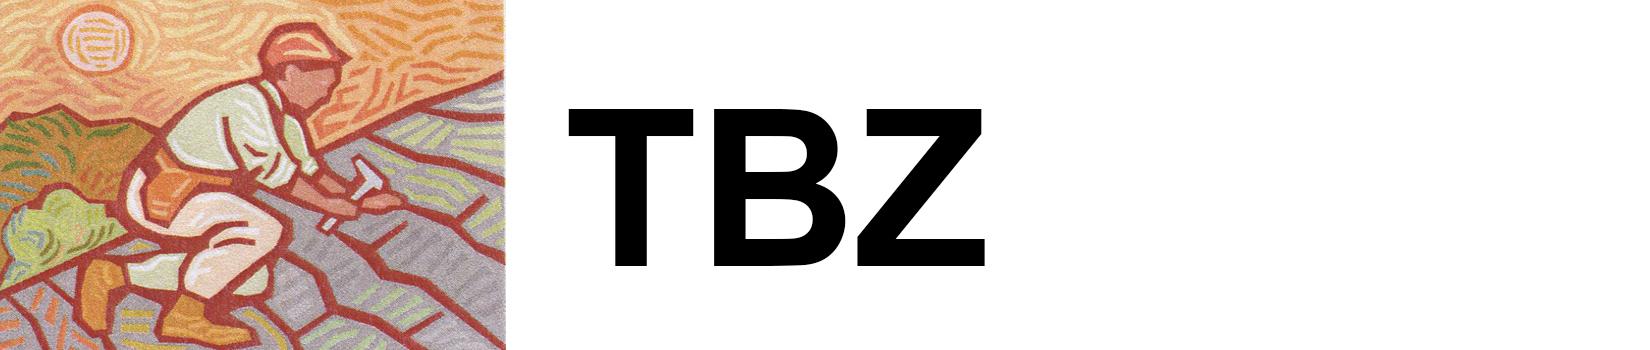 bandeau_tbz